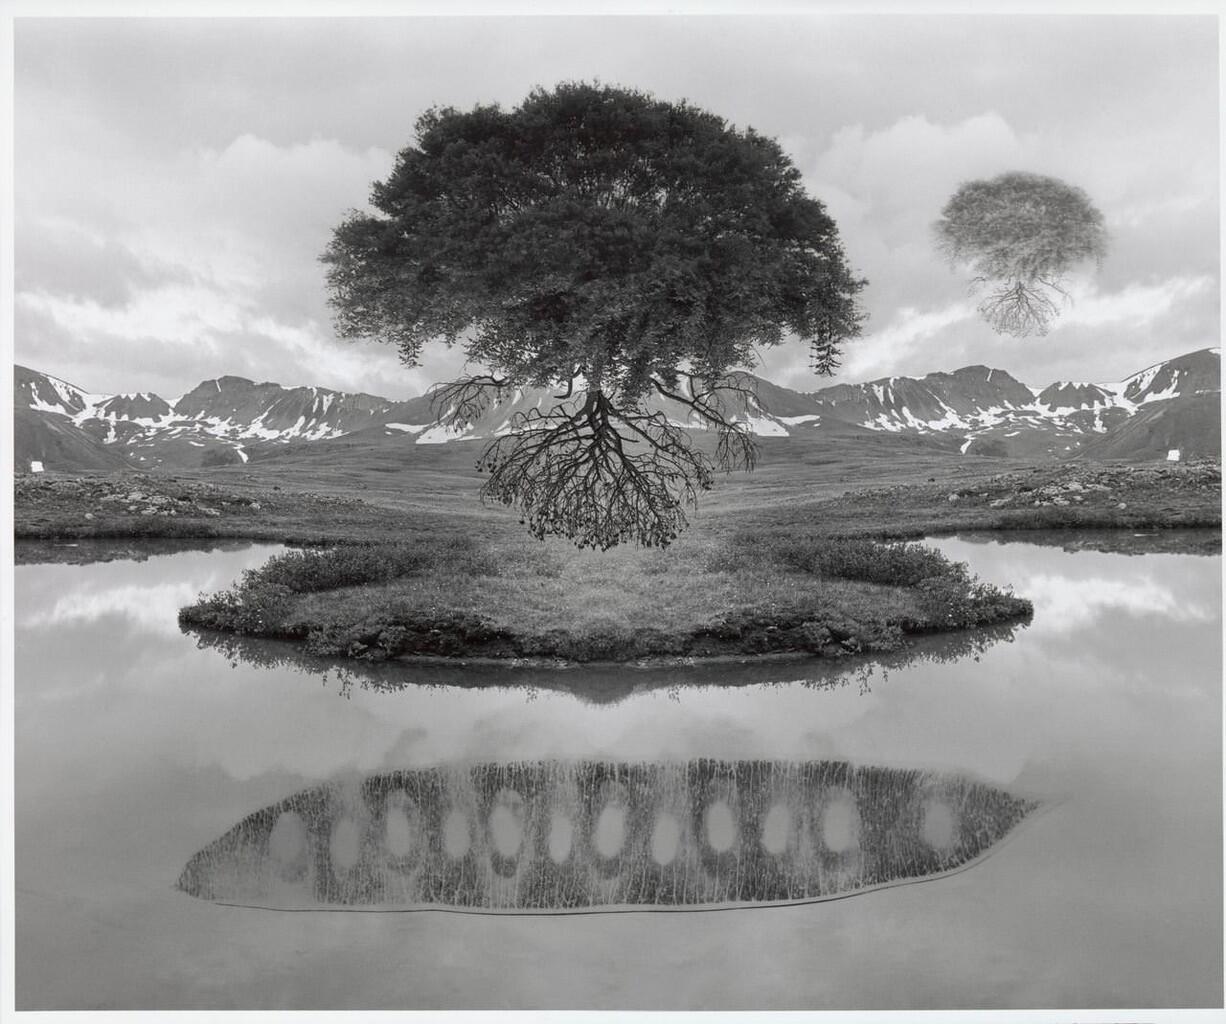 [HOT] Jerry Uelsmann, Master Manipulasi Foto Sebelum Era Digital